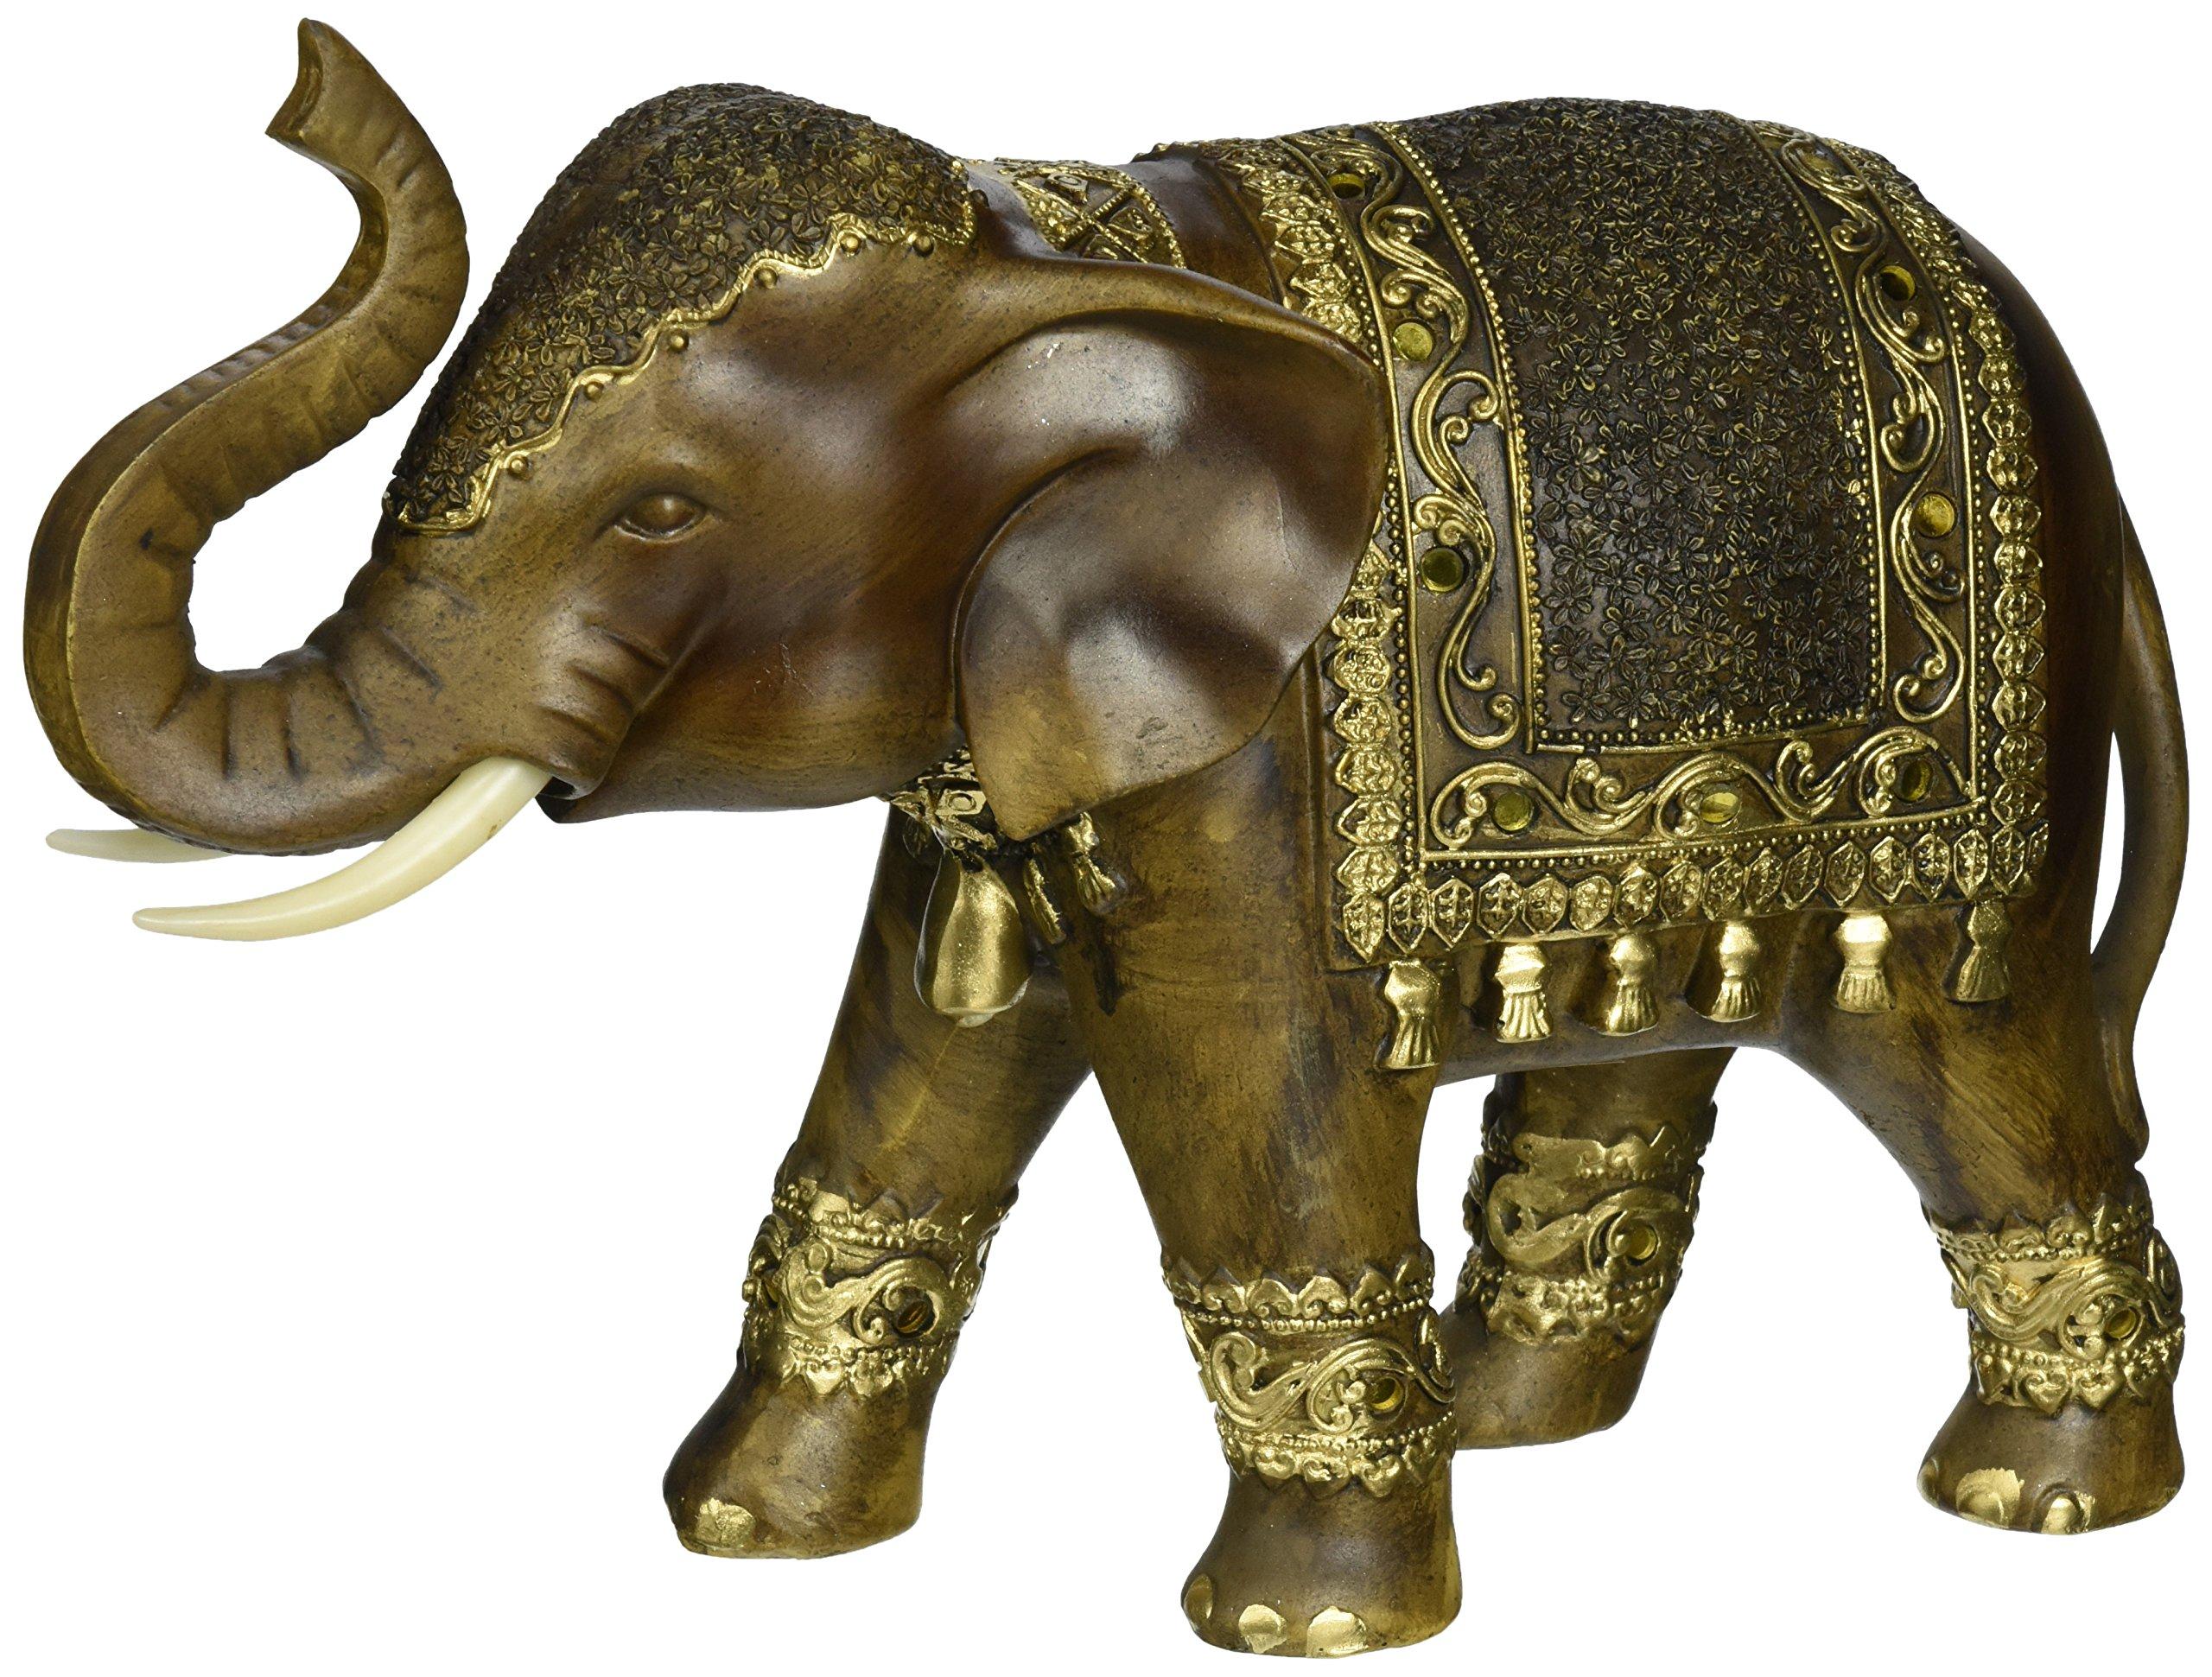 Deco 79 Polystone Elephant, 11 by 8-Inch by Deco 79 (Image #2)